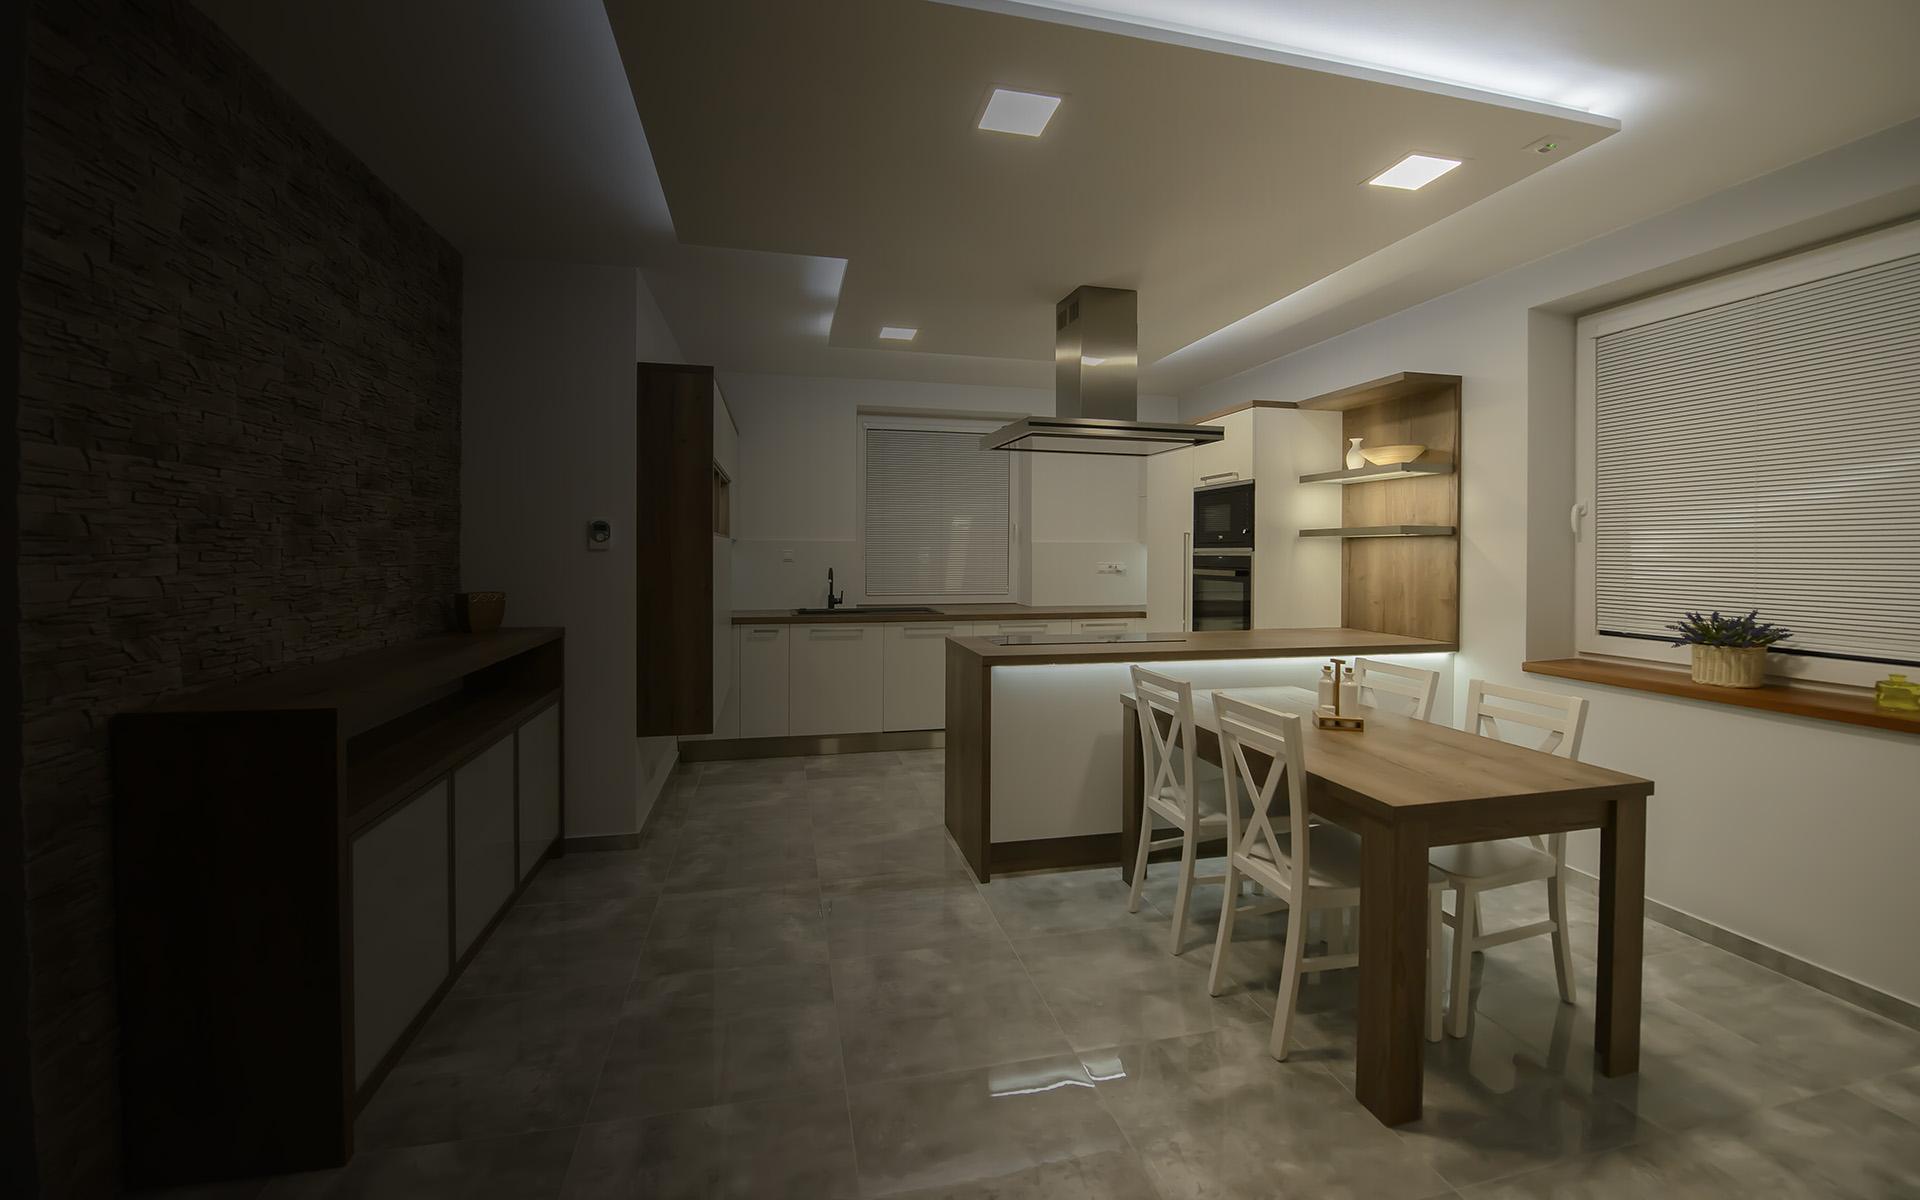 kuchyna4.jpg